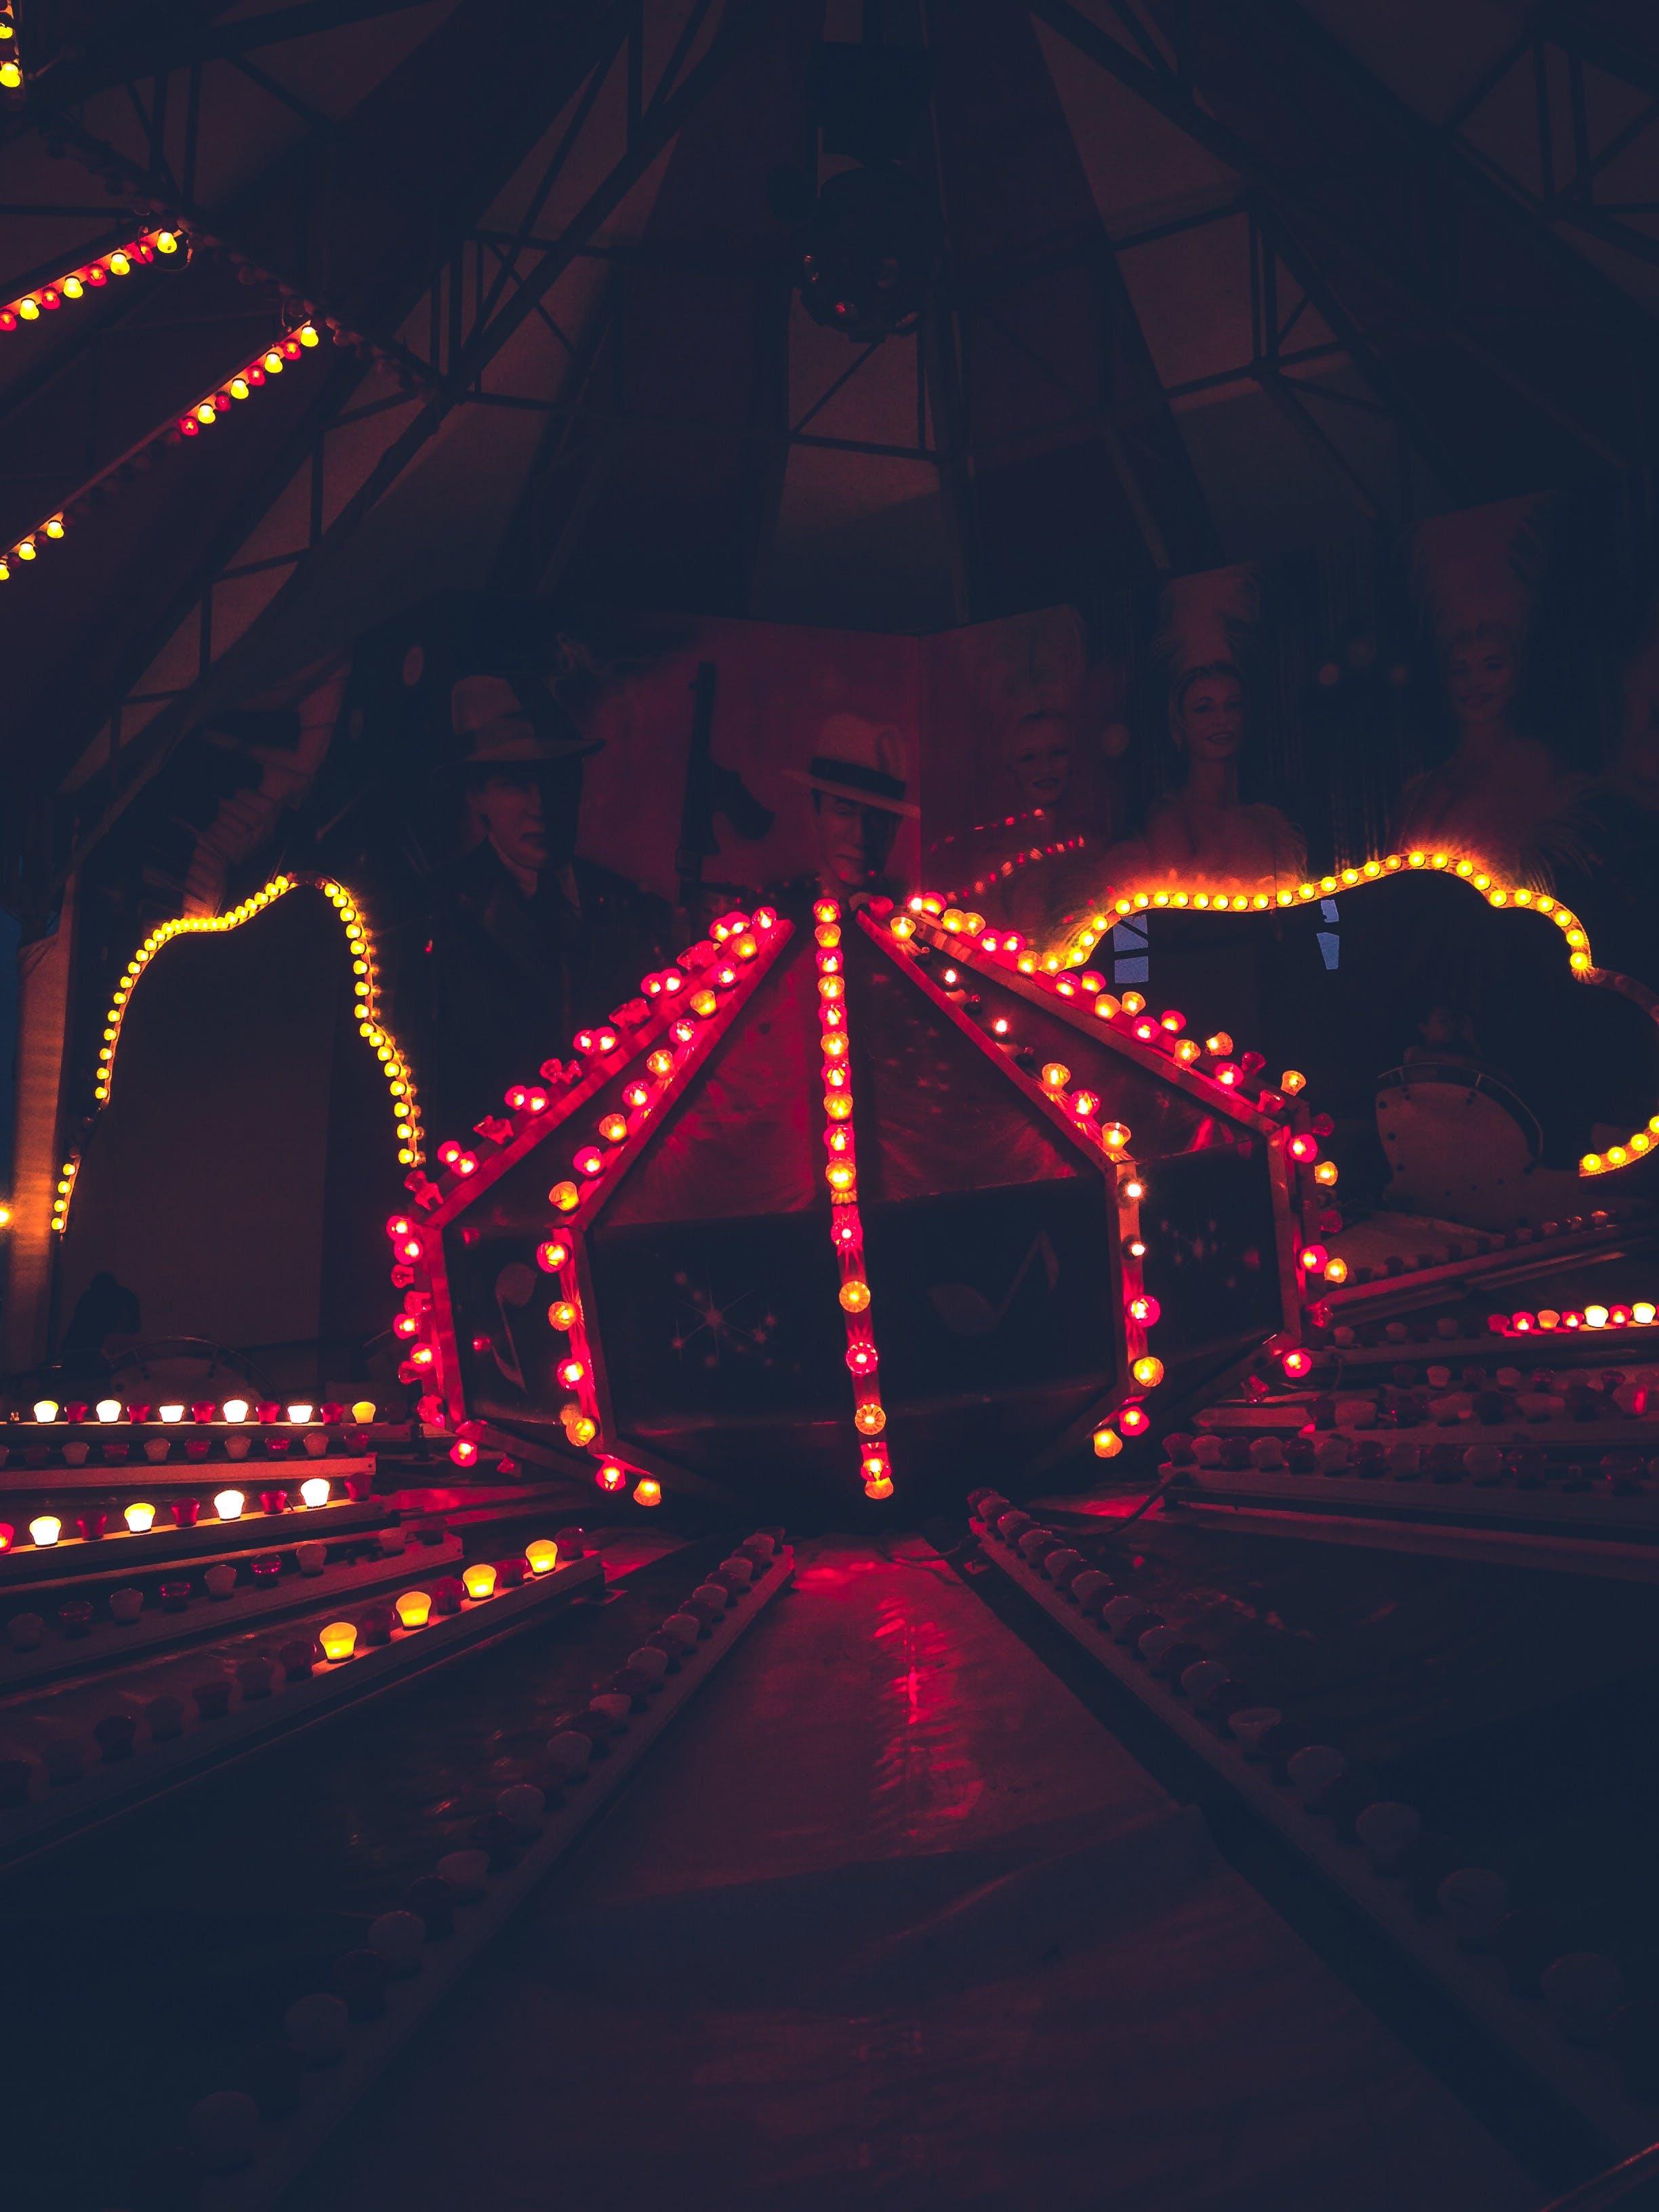 Free stock photo of amusement park, attraction, big wheel, Bumper cars